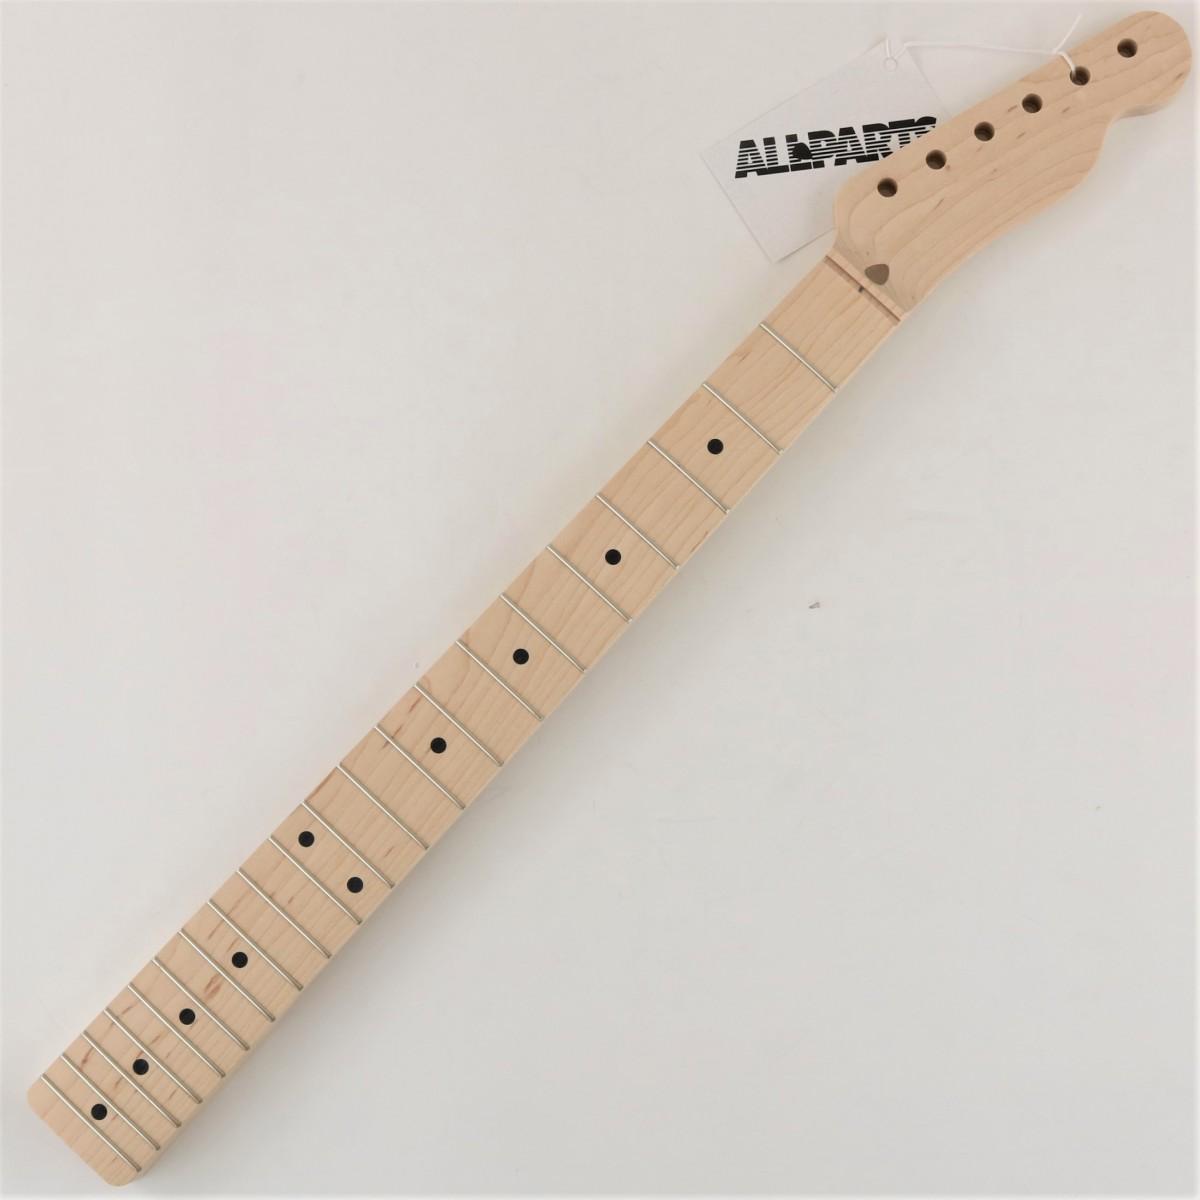 Traynor Tc410 Neo Cabinet 4x10 Neodymium